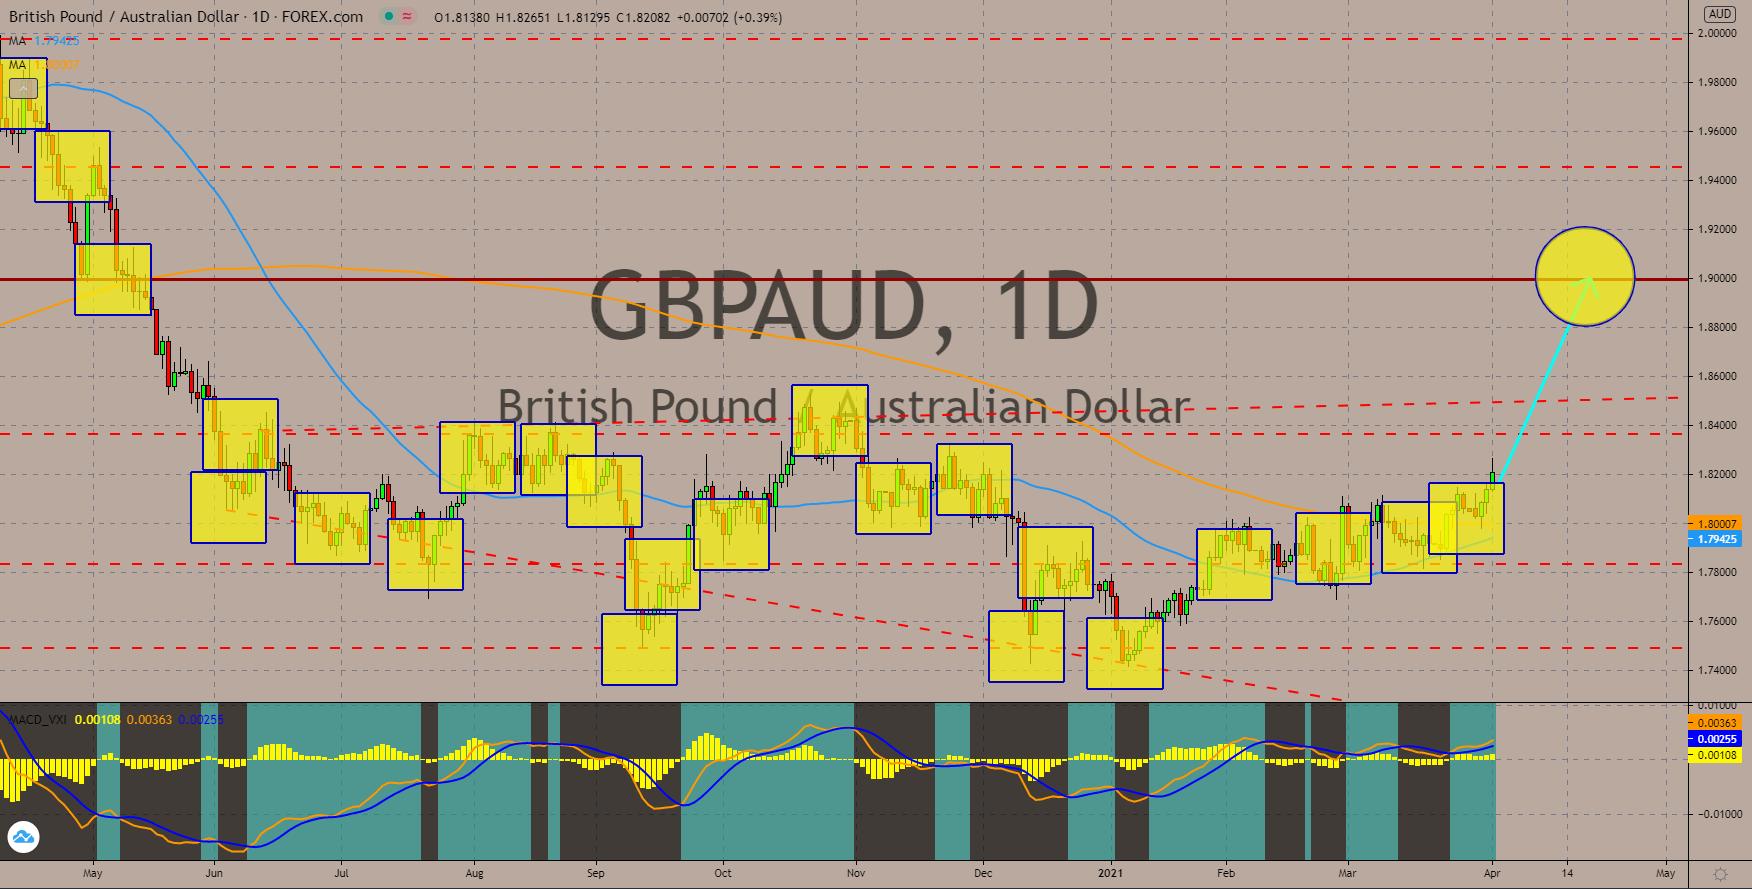 Charts, Daily Market Charts and Analysis April 01, 2021